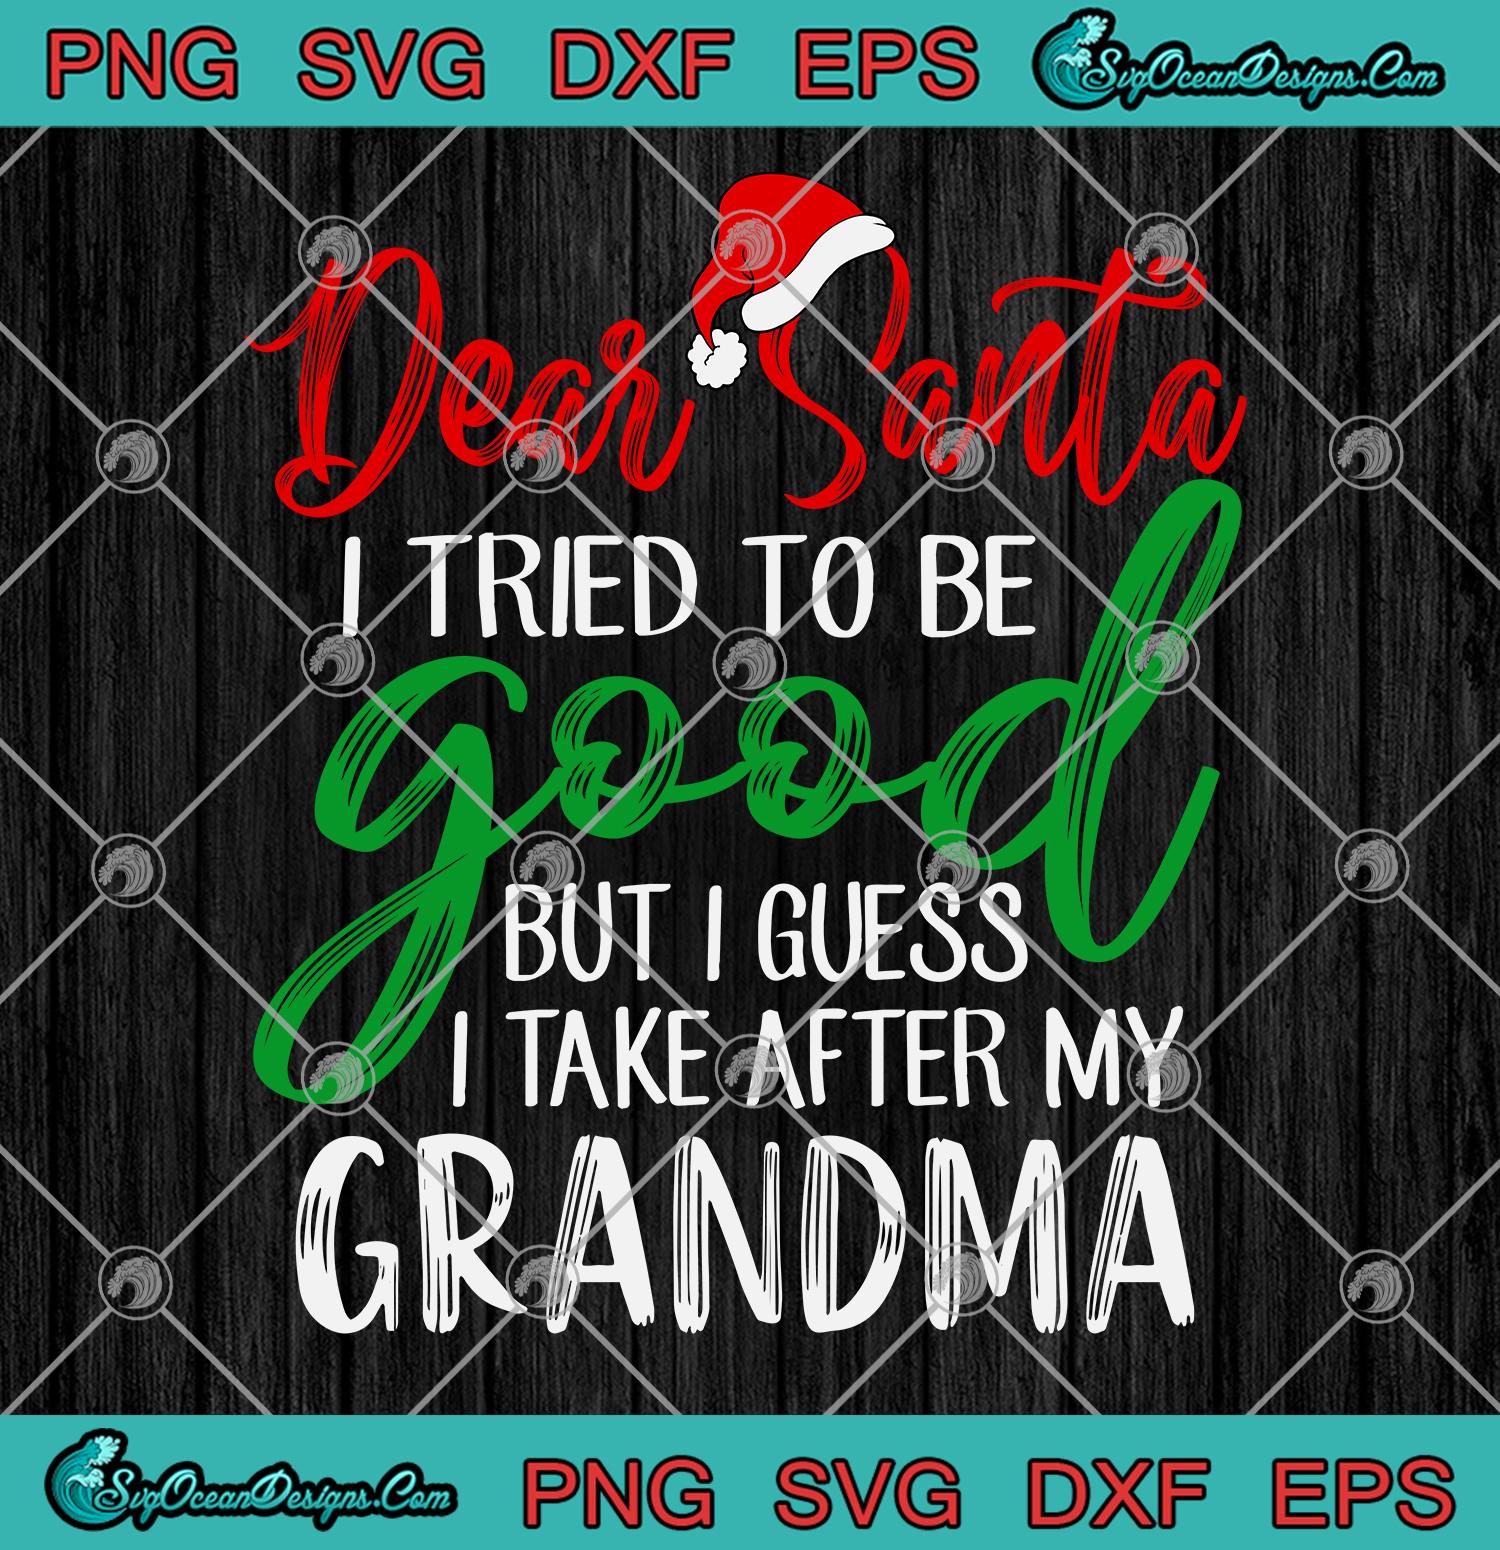 Dear Santa I Tried To Be Good But I Take After My Grandma Svg Png Eps Dxf Grandma Christmas Cricut Silhouette Cameo Svg Designs Digital Download